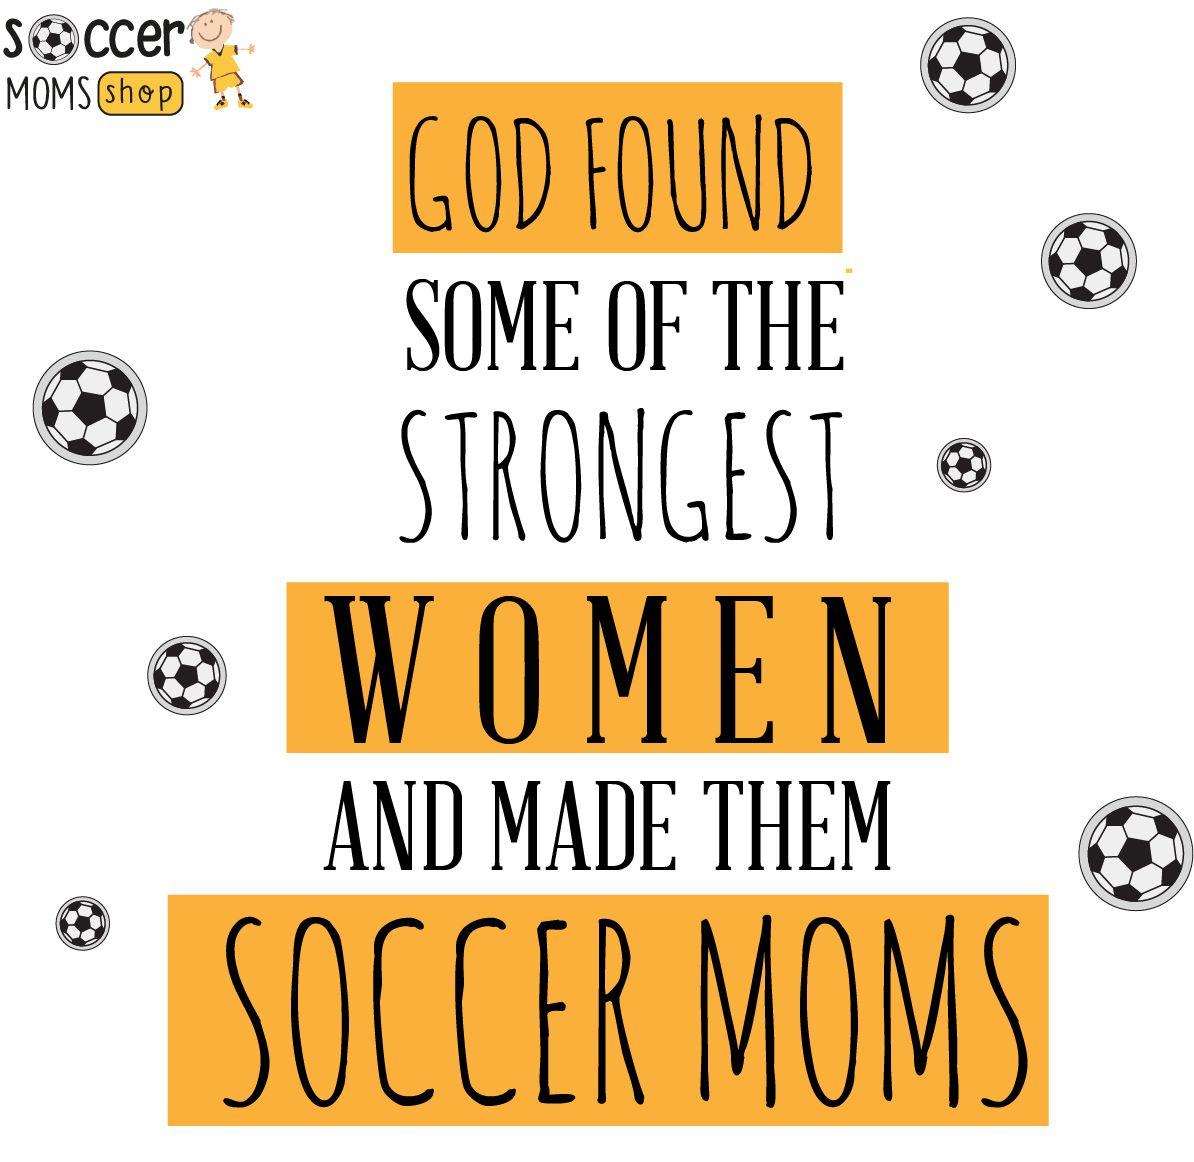 Soccer Mom Soccer Mom Quotes Soccer Mom Love My Boys